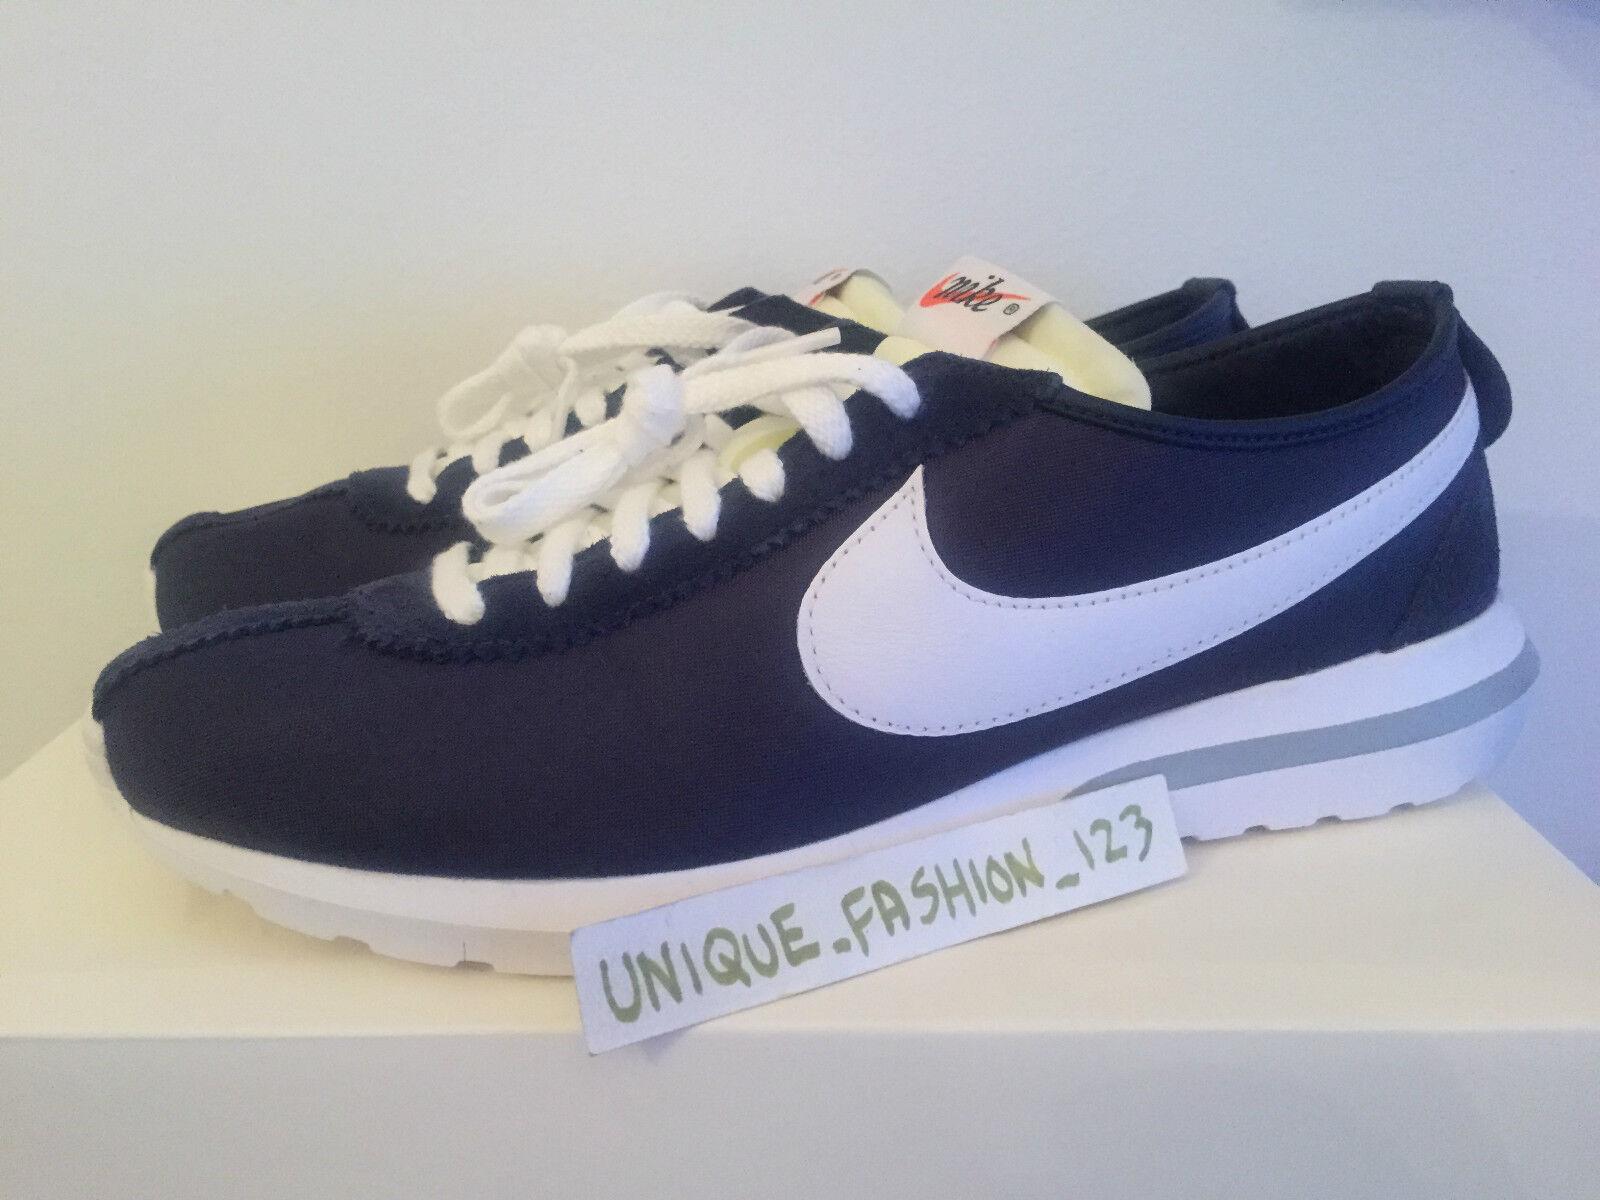 Nike roshe Cortez SP Fragment Design Us 10 Uk 9 44 Hiroshi bleu marine 806964-410